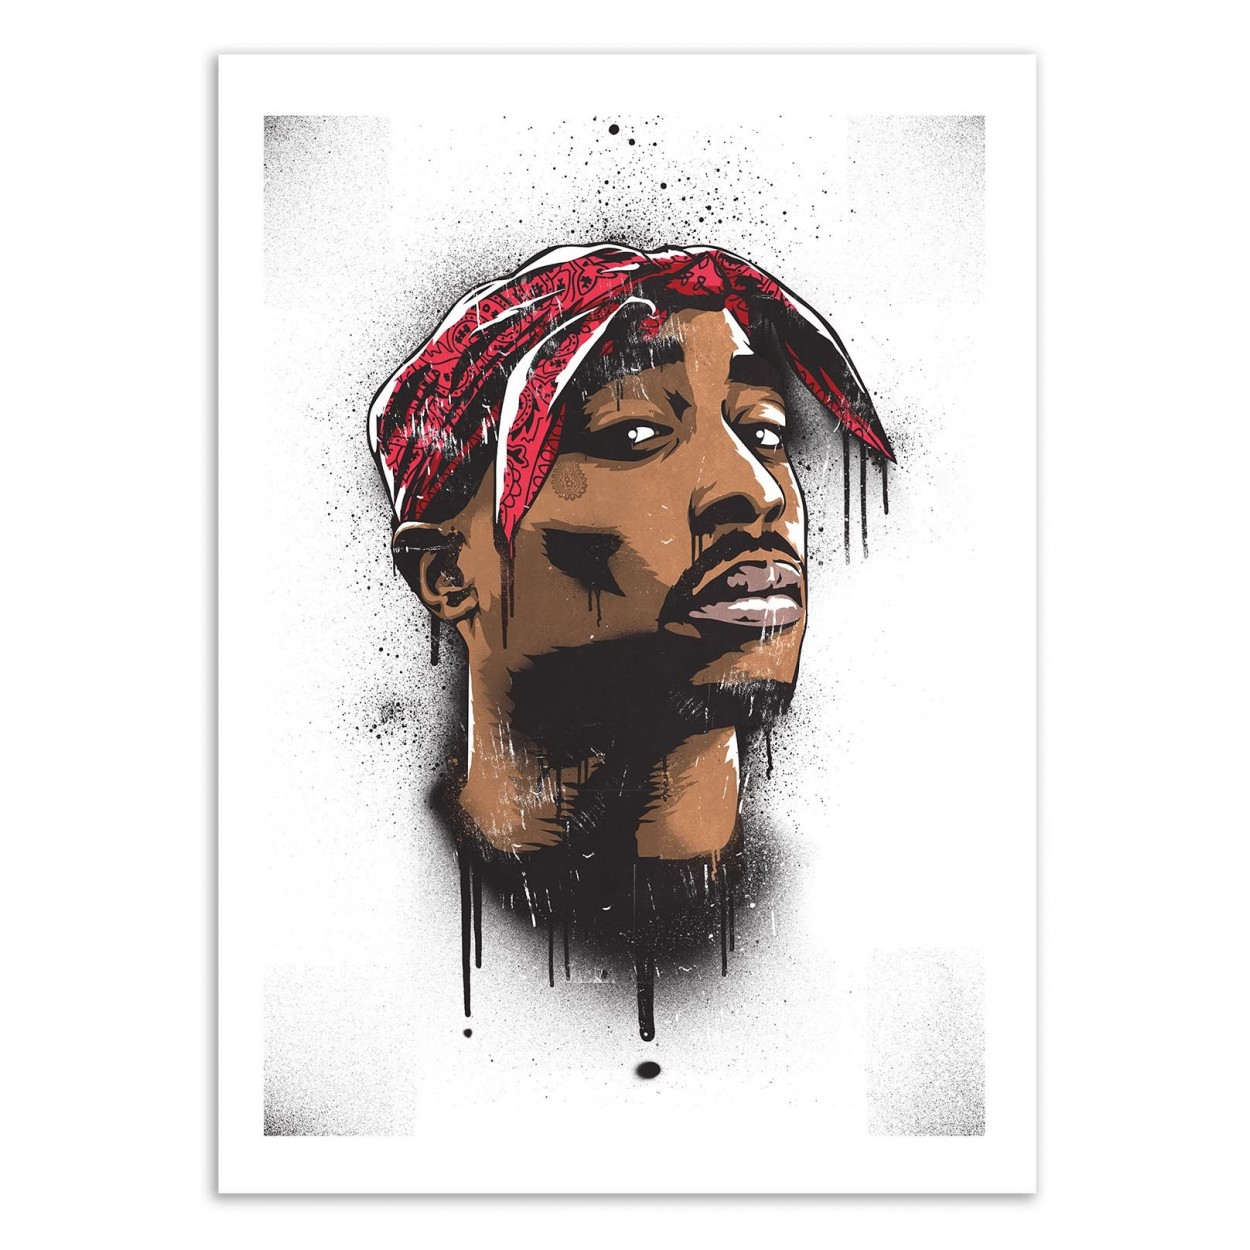 Art-Poster Rap And Hip-hop